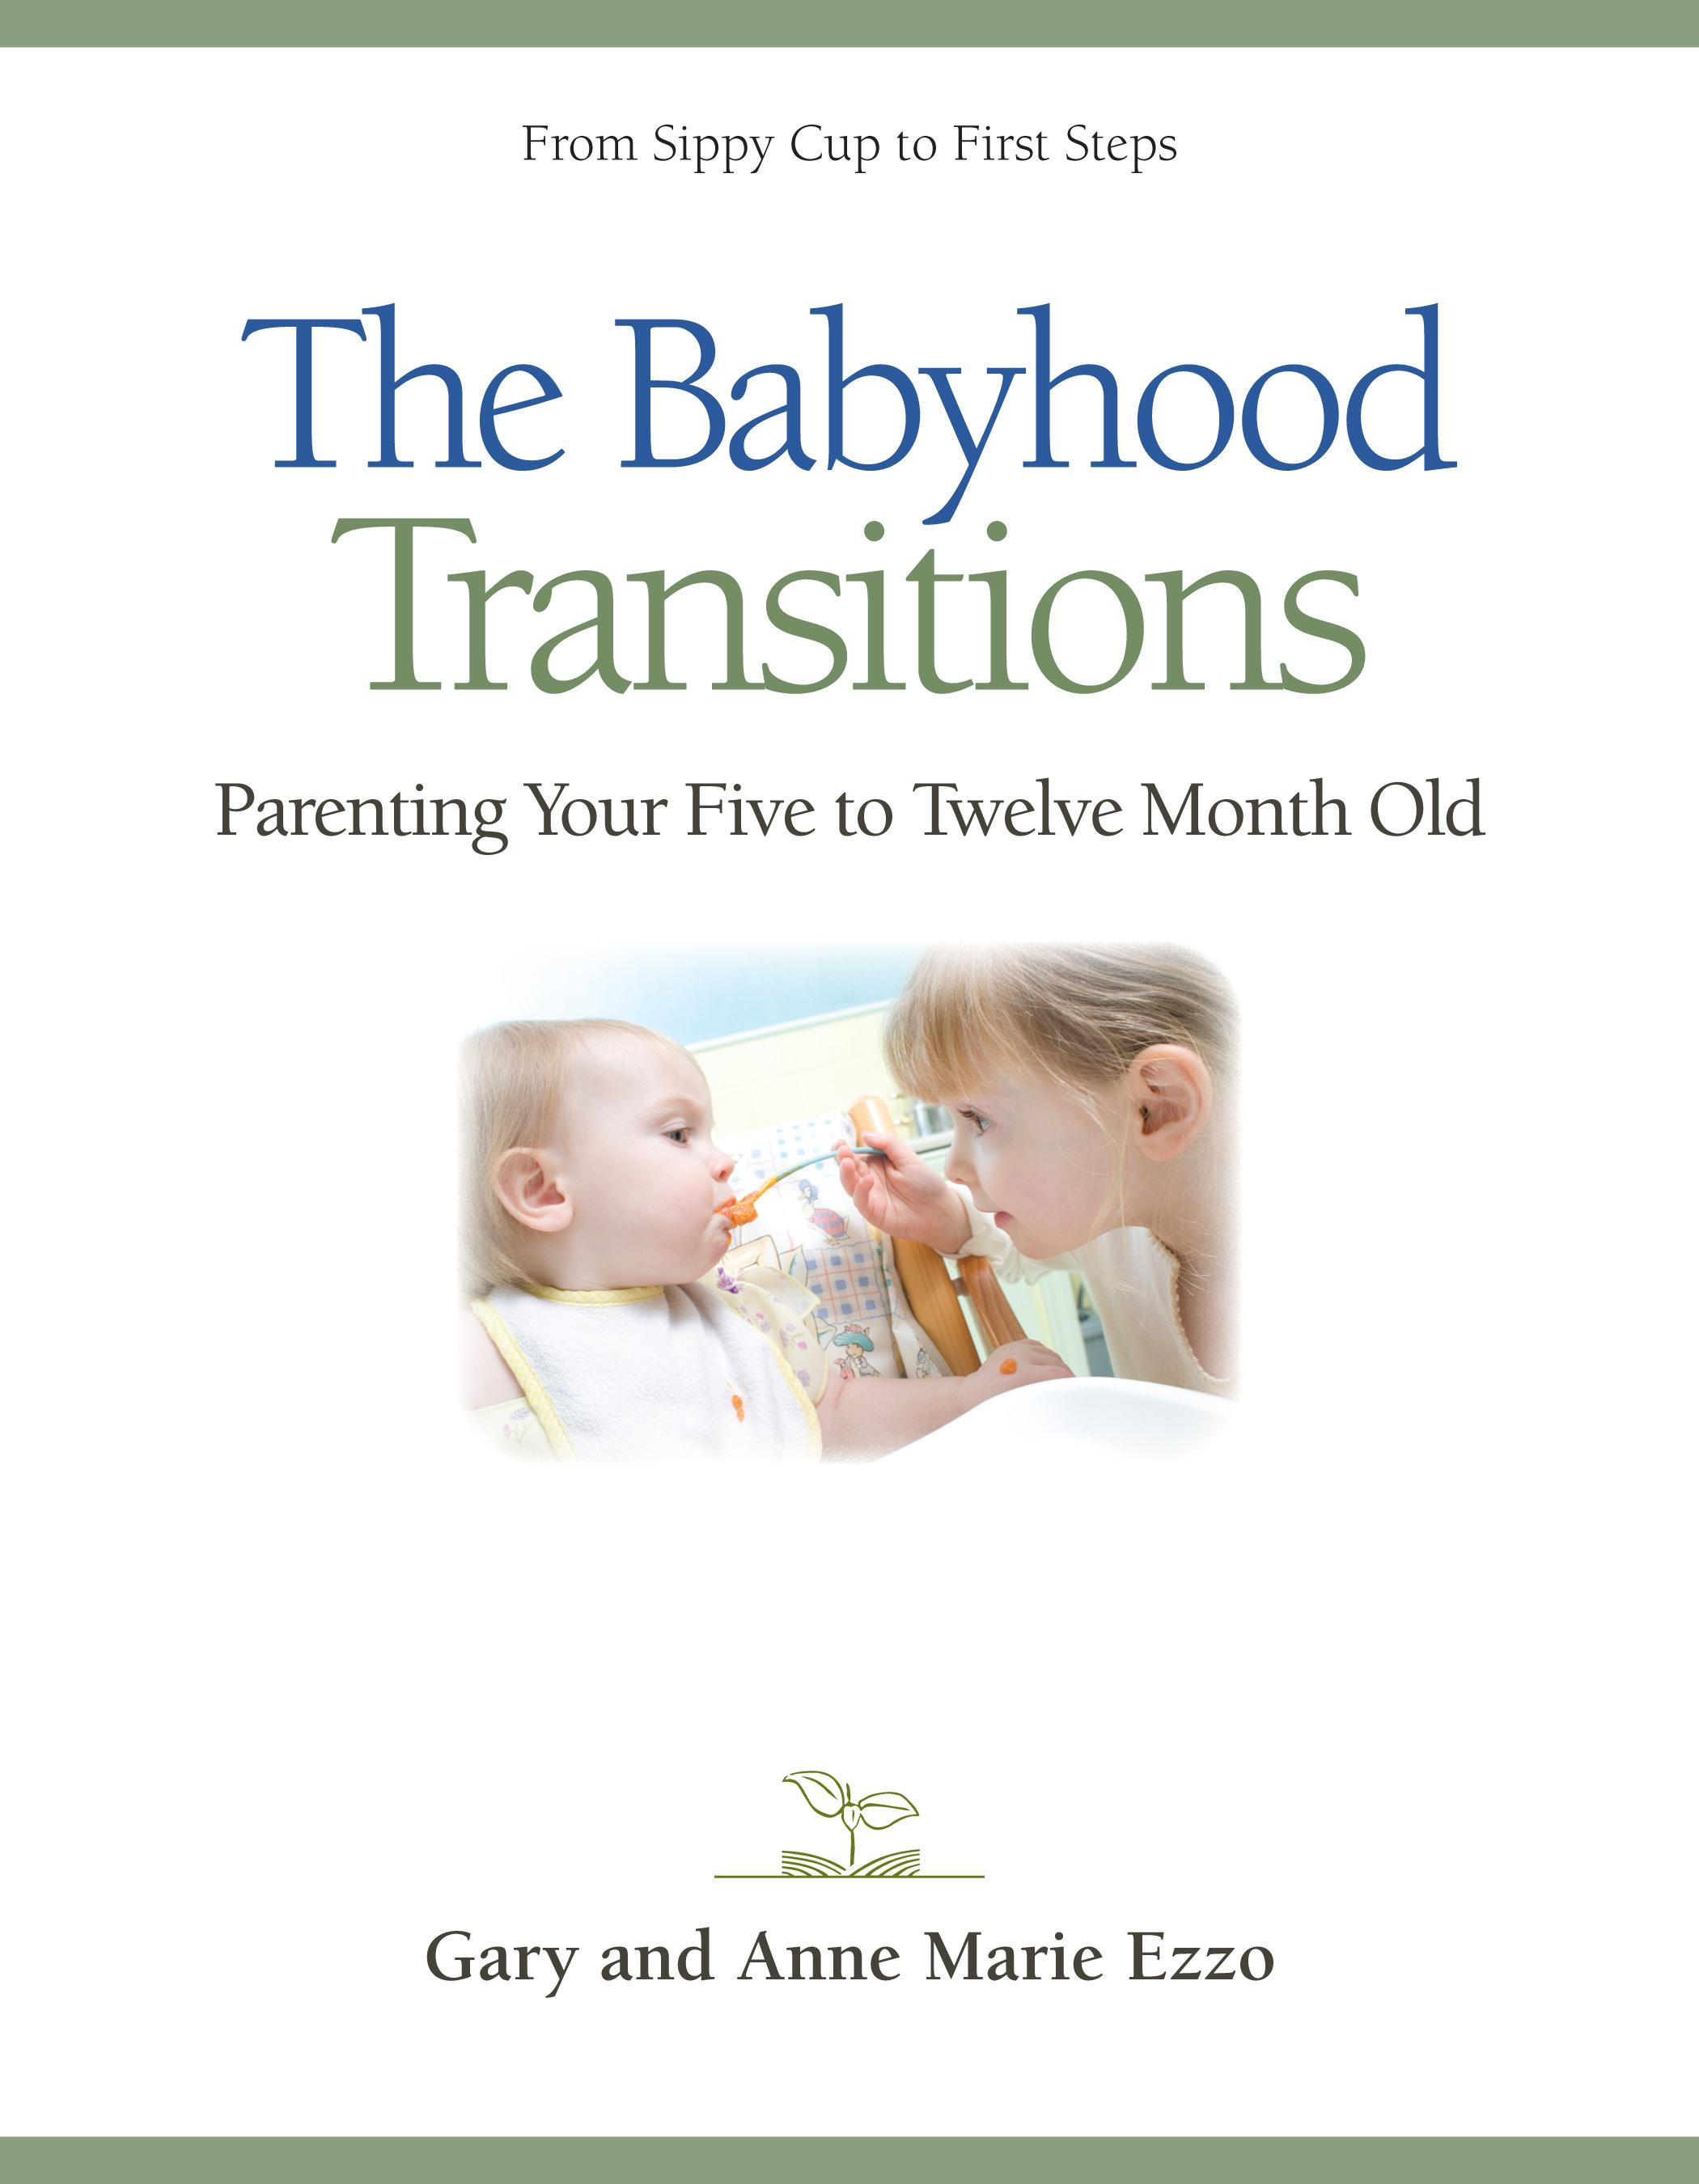 202 Babyhood Transitions Cover copy.jpg